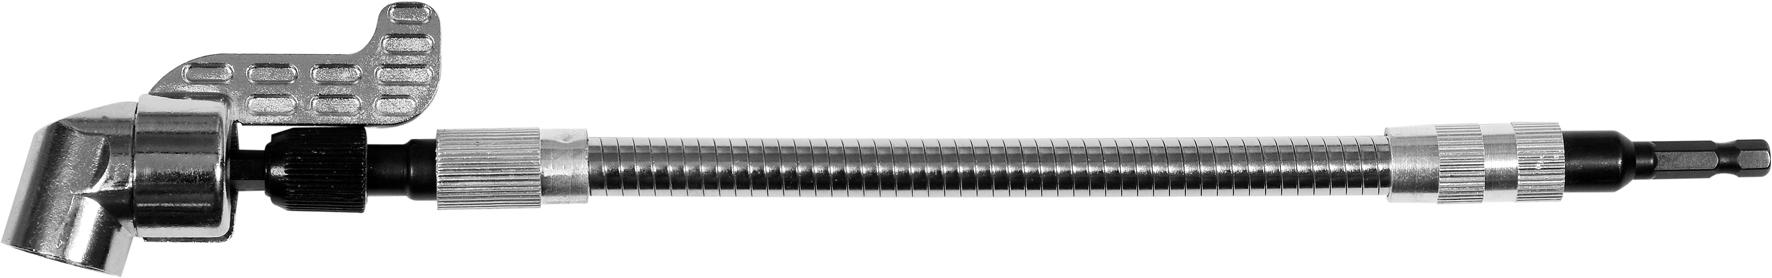 "Prodlužovací úhlový adaptér ohebný 1/4"" 325mm"